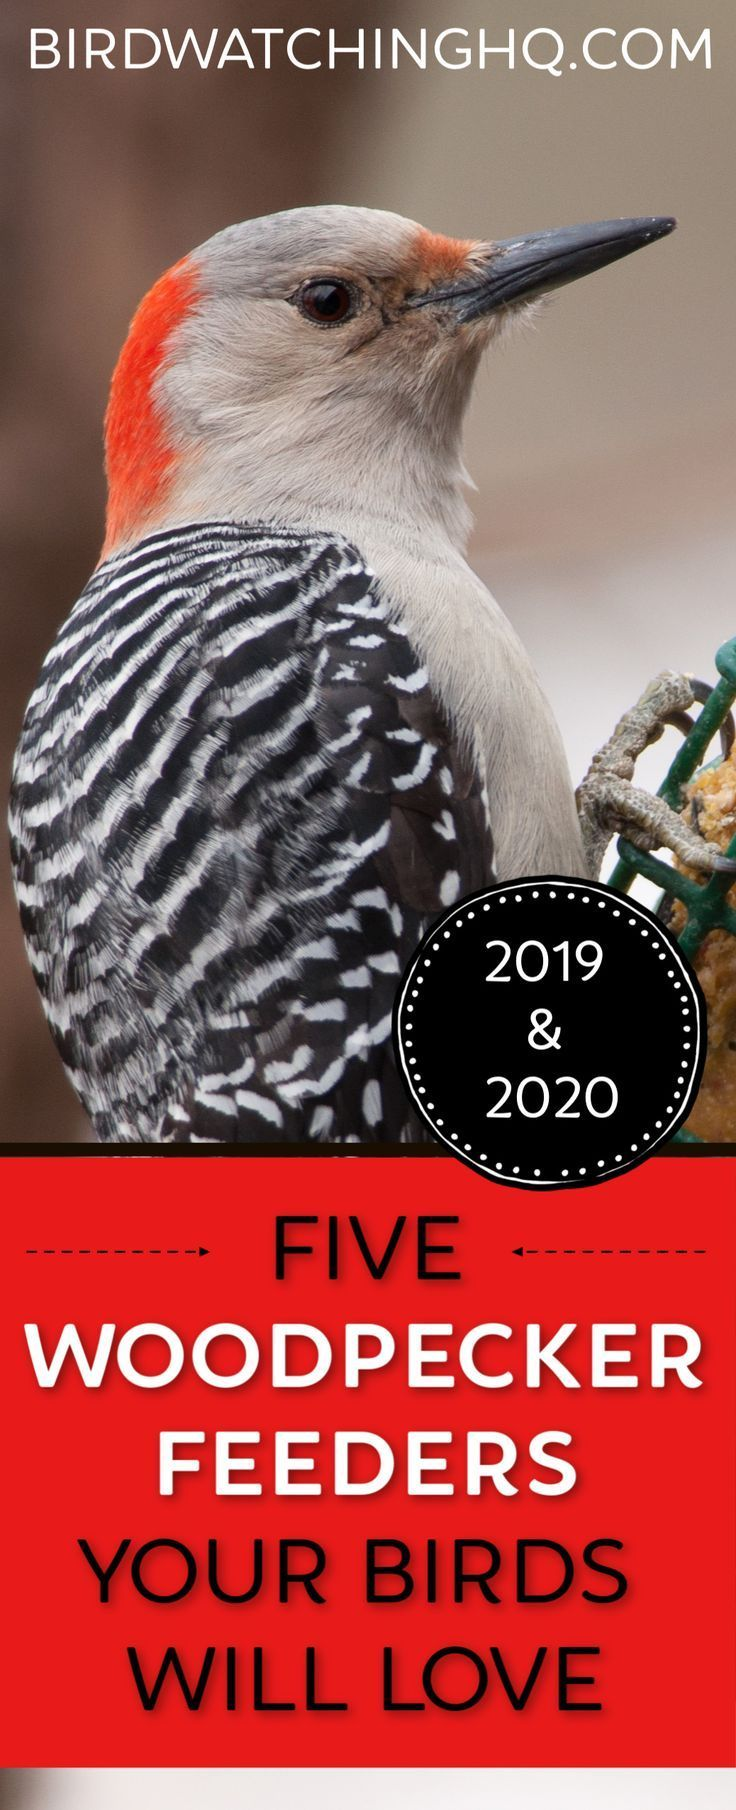 5 Woodpecker Feeders Your Birds Will LOVE (2020